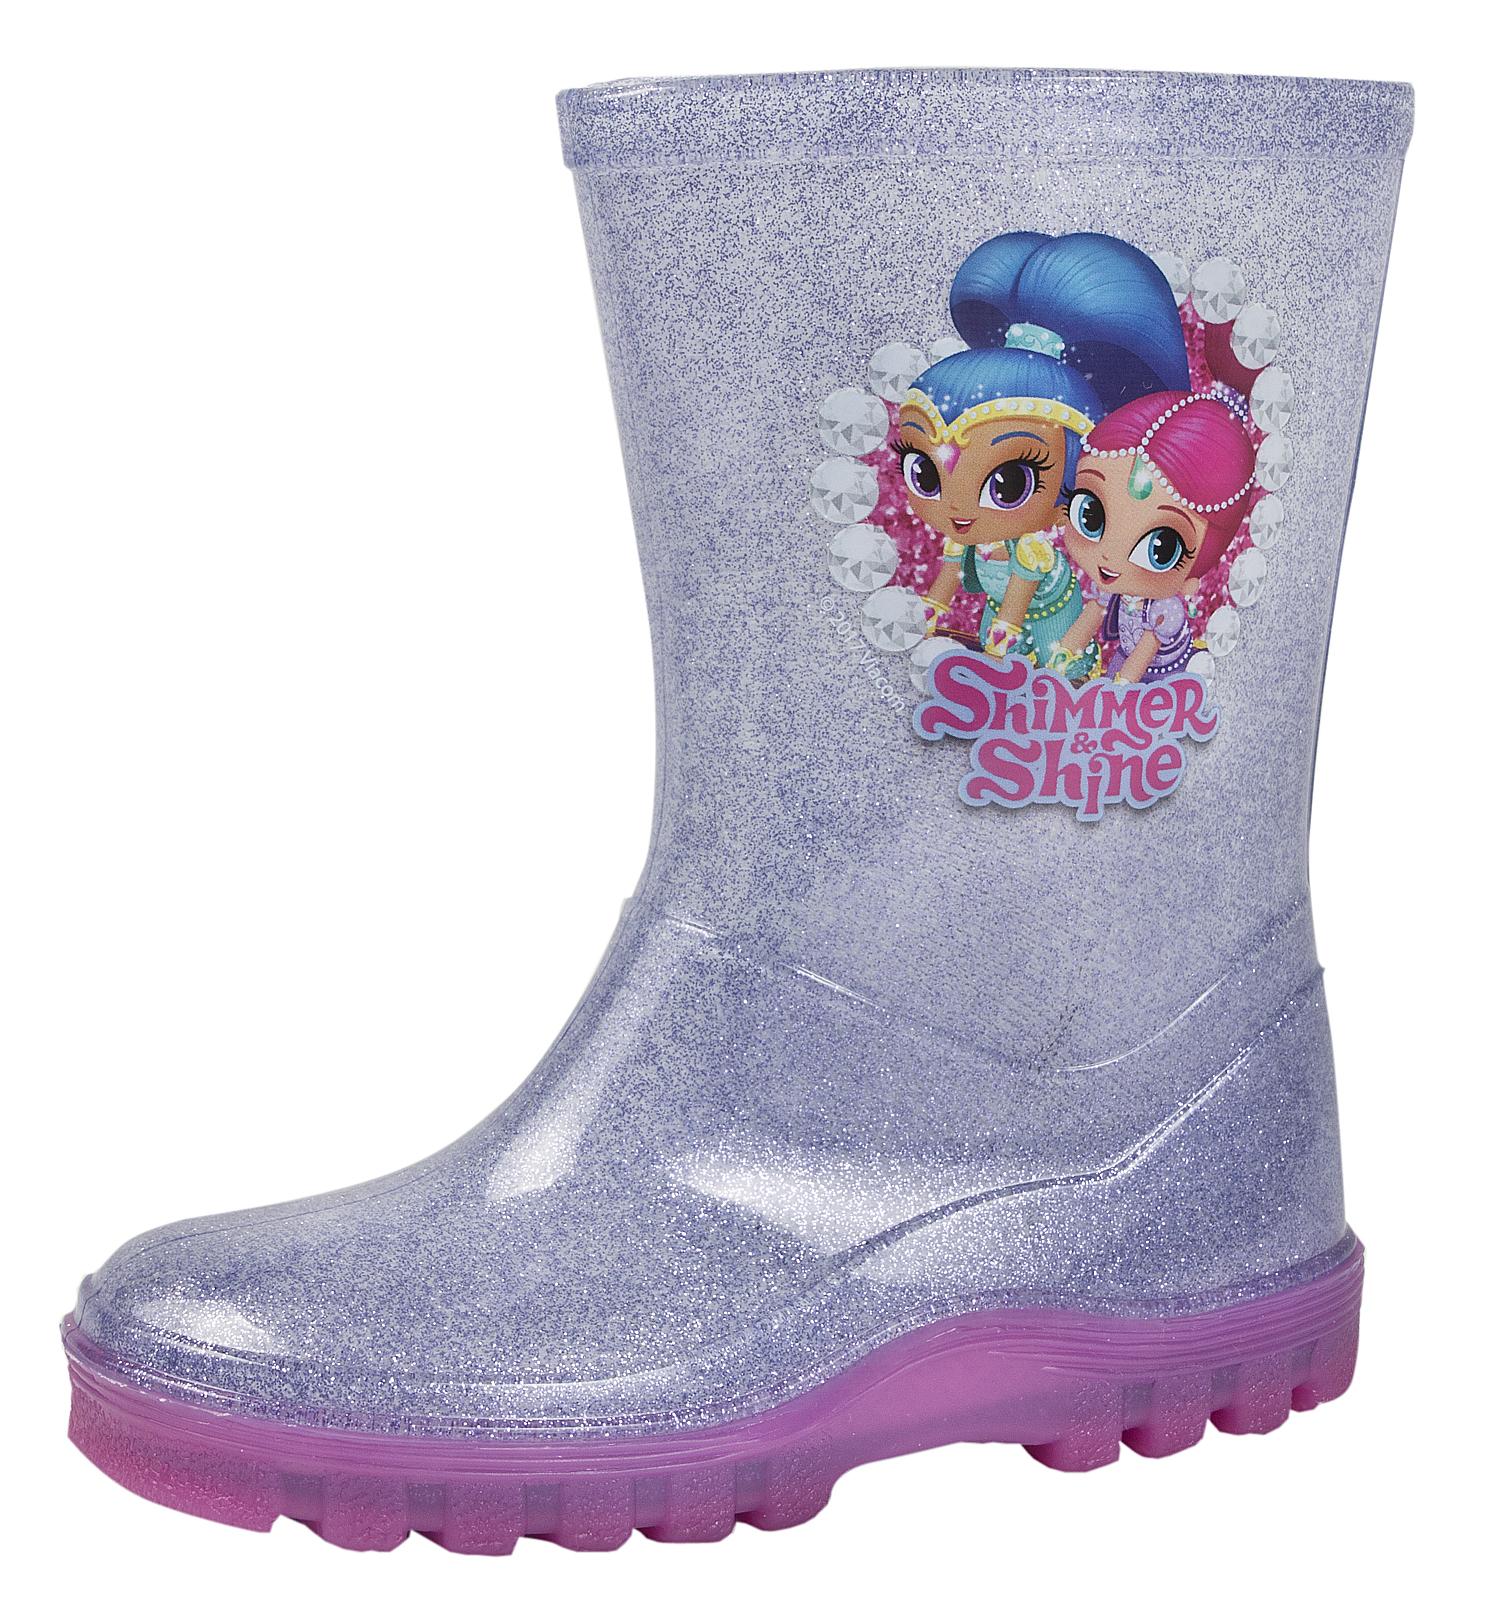 Shimmer /& Shine Girls Wellington Rain Boots Wellys